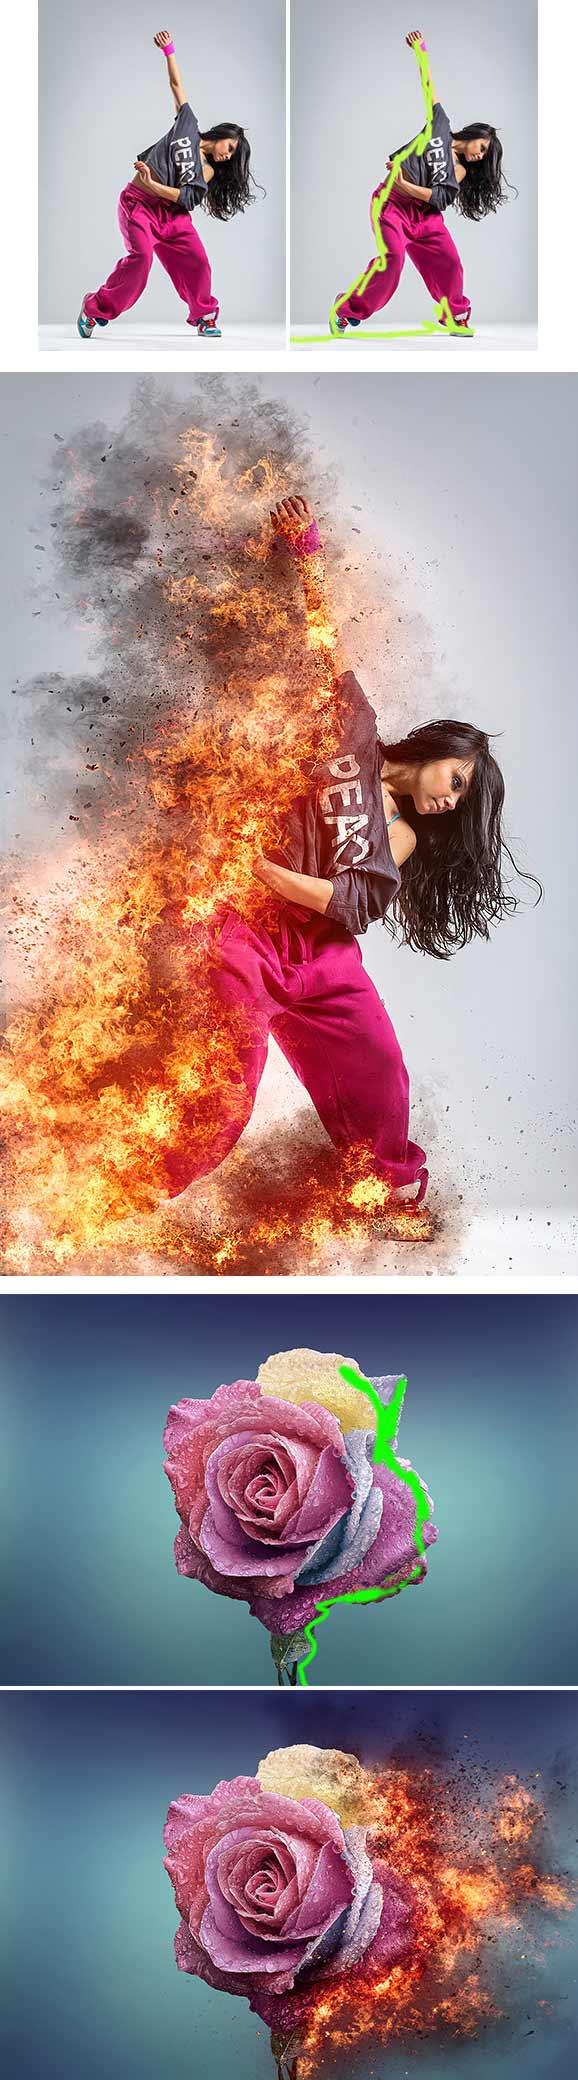 3377 firestorm photoshop action โปรแกรมทำเปลวไฟออกจากรูป